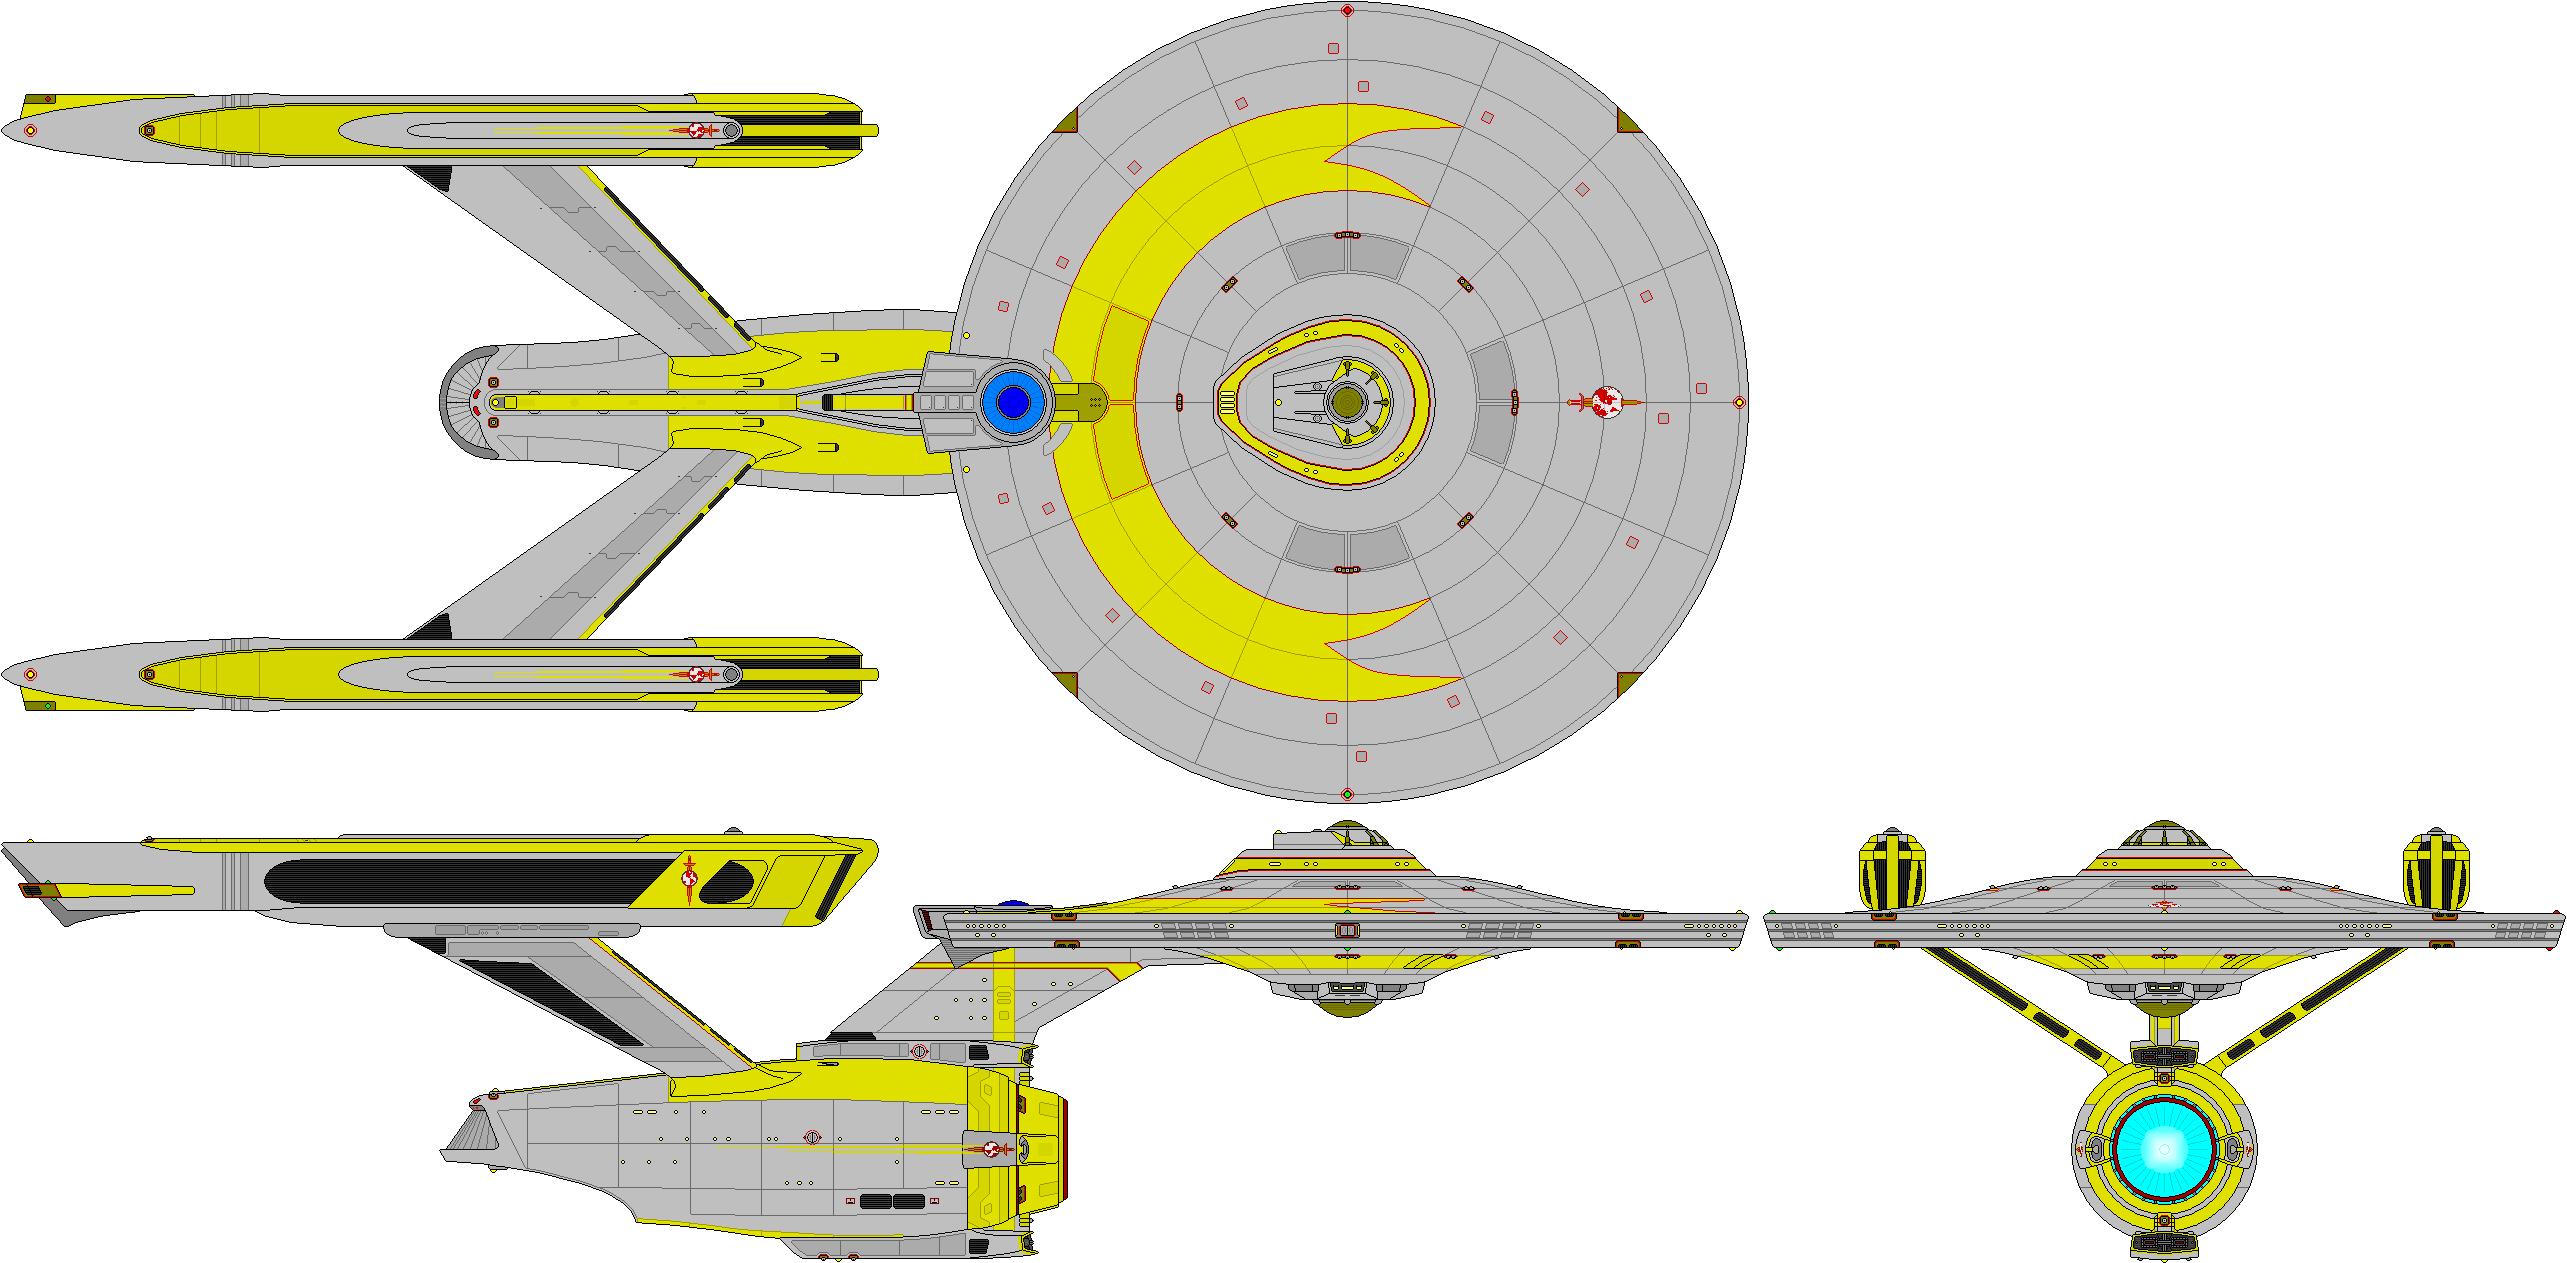 Star Trek Terran Empire Logo By Gazomg Star Trek Original Star Trek Original Series Star Trek